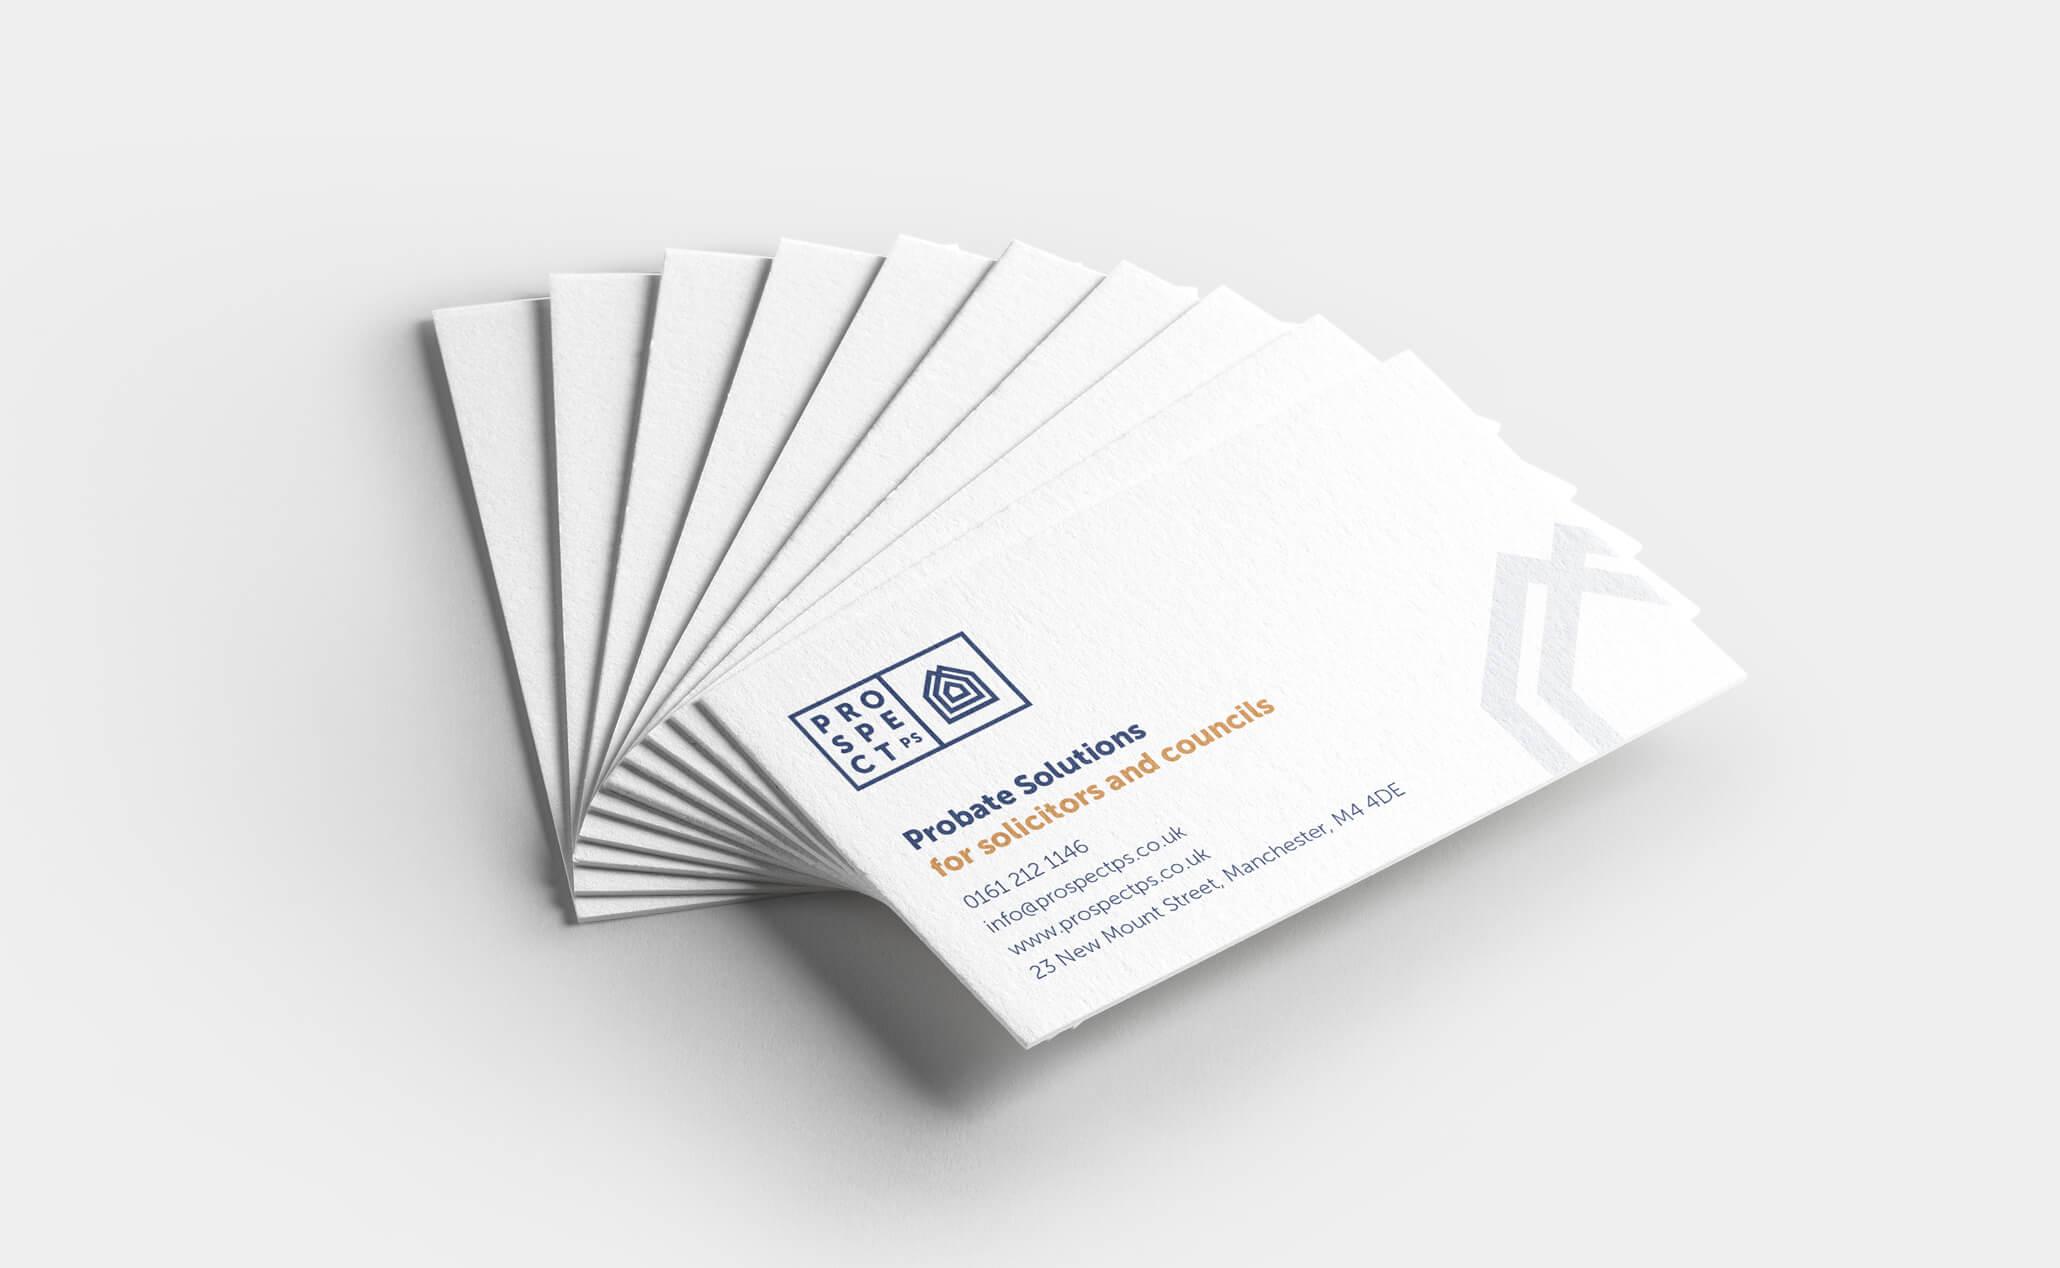 ProspectPS - business cards